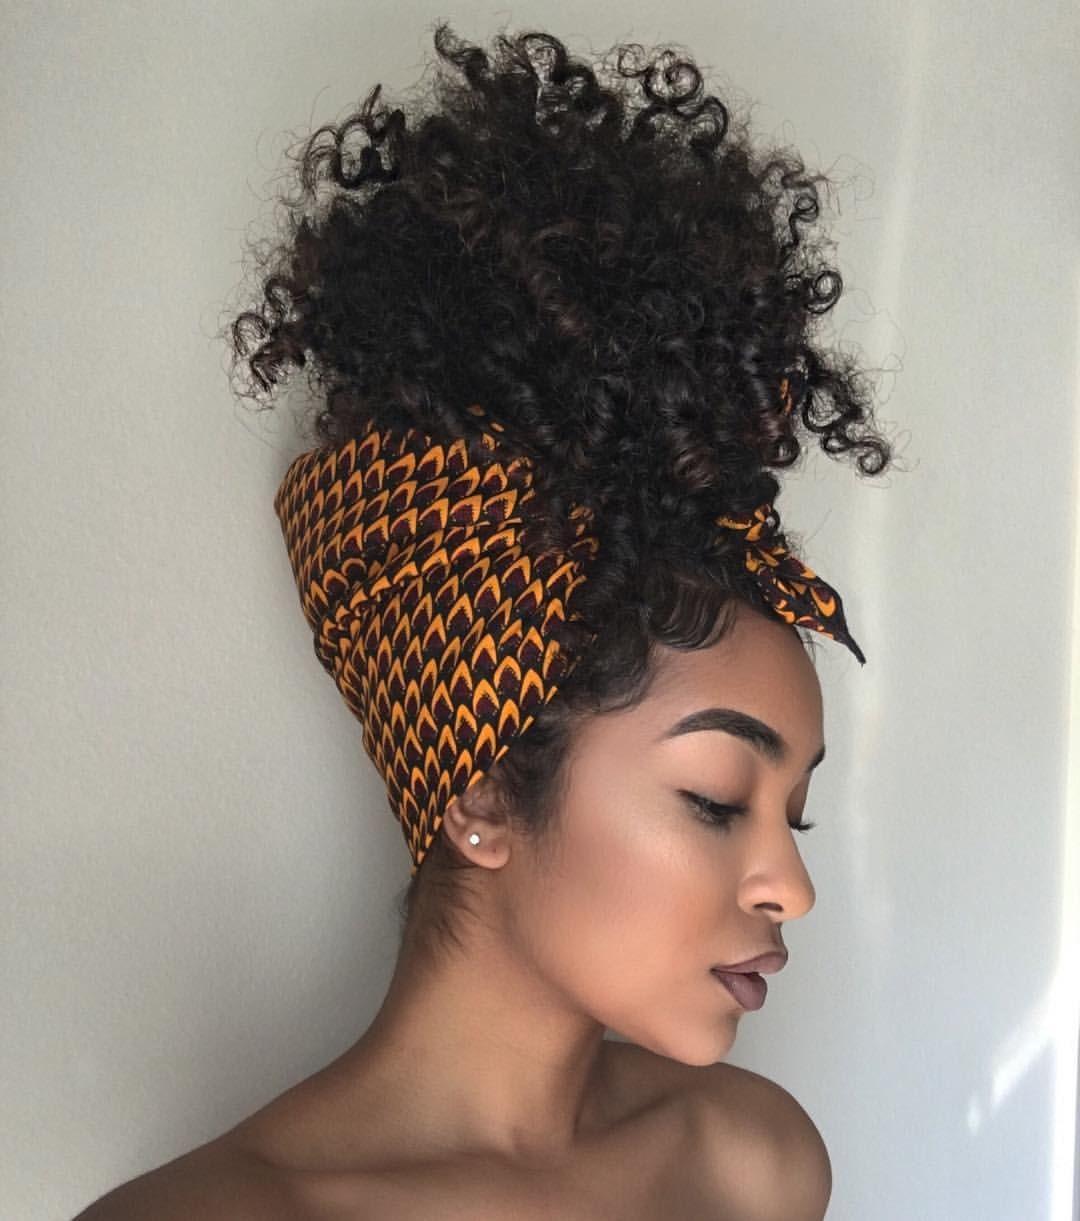 alexandra_nx - Ma Coiffeuse Afro